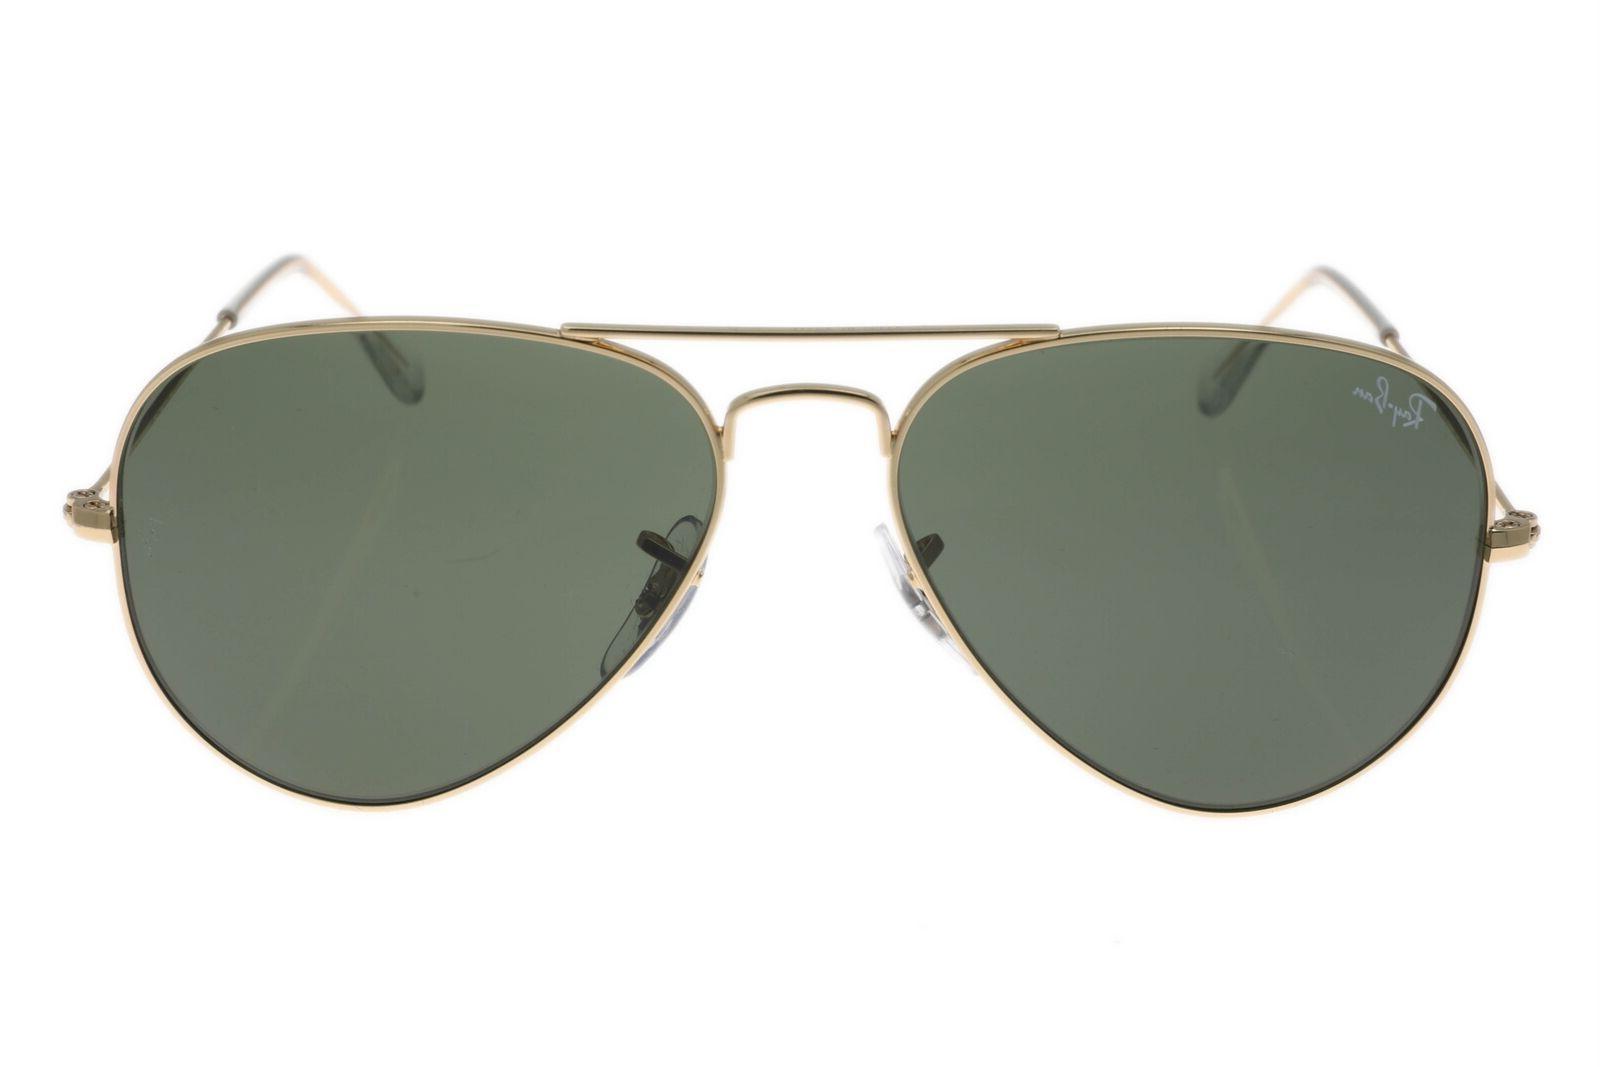 3025 sunglasses code 001